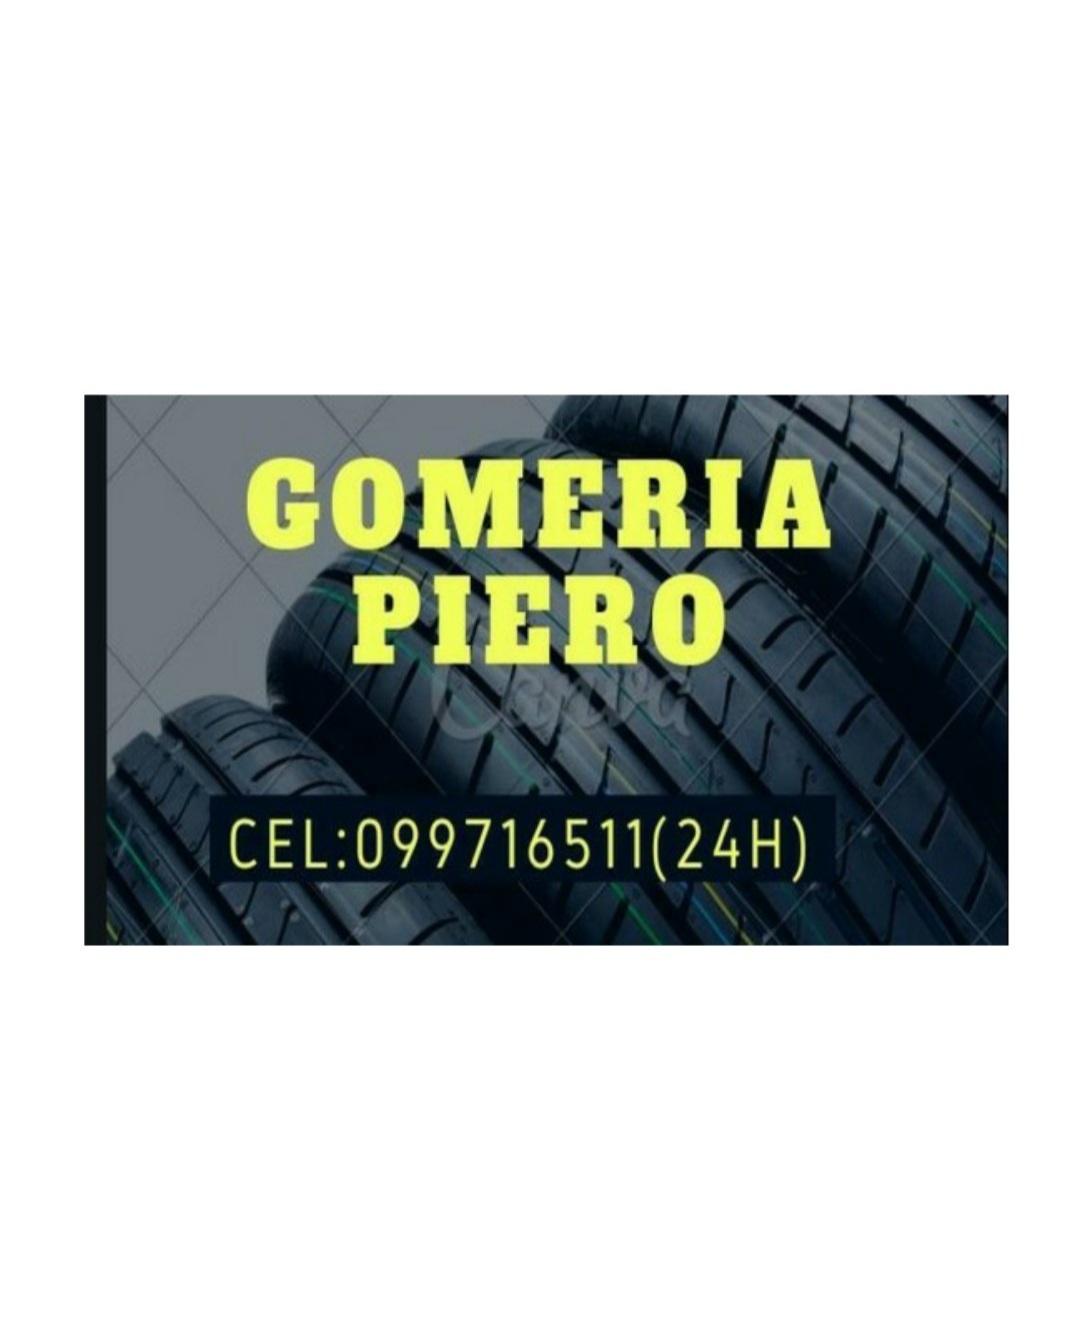 GOMERIA PIERO